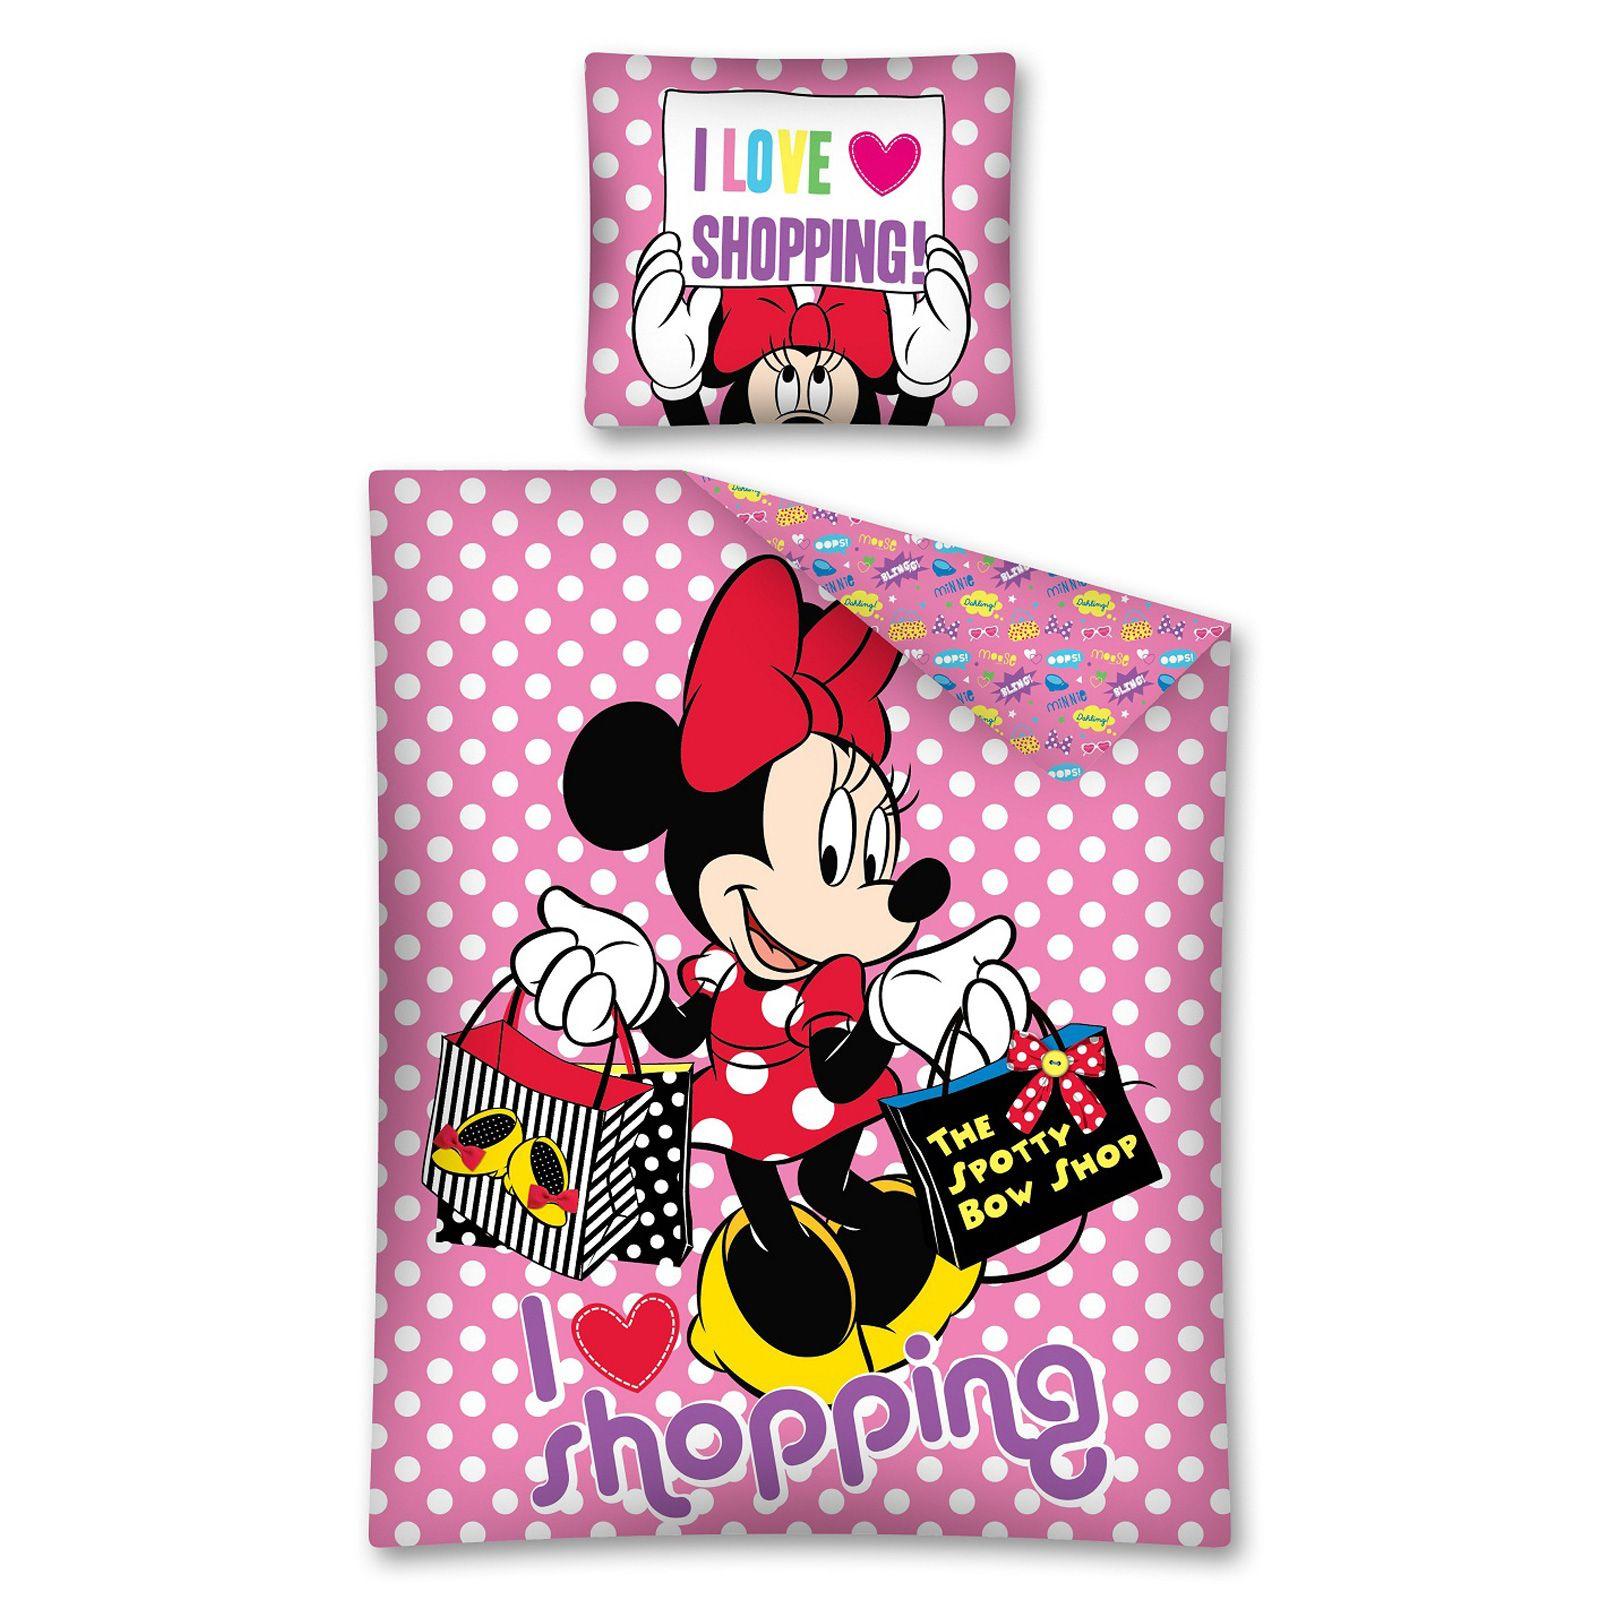 DISNEY-MICKEY-amp-MINNIE-MOUSE-SINGLE-JUNIOR-DUVET-COVER-SETS-KIDS-BEDDING thumbnail 44